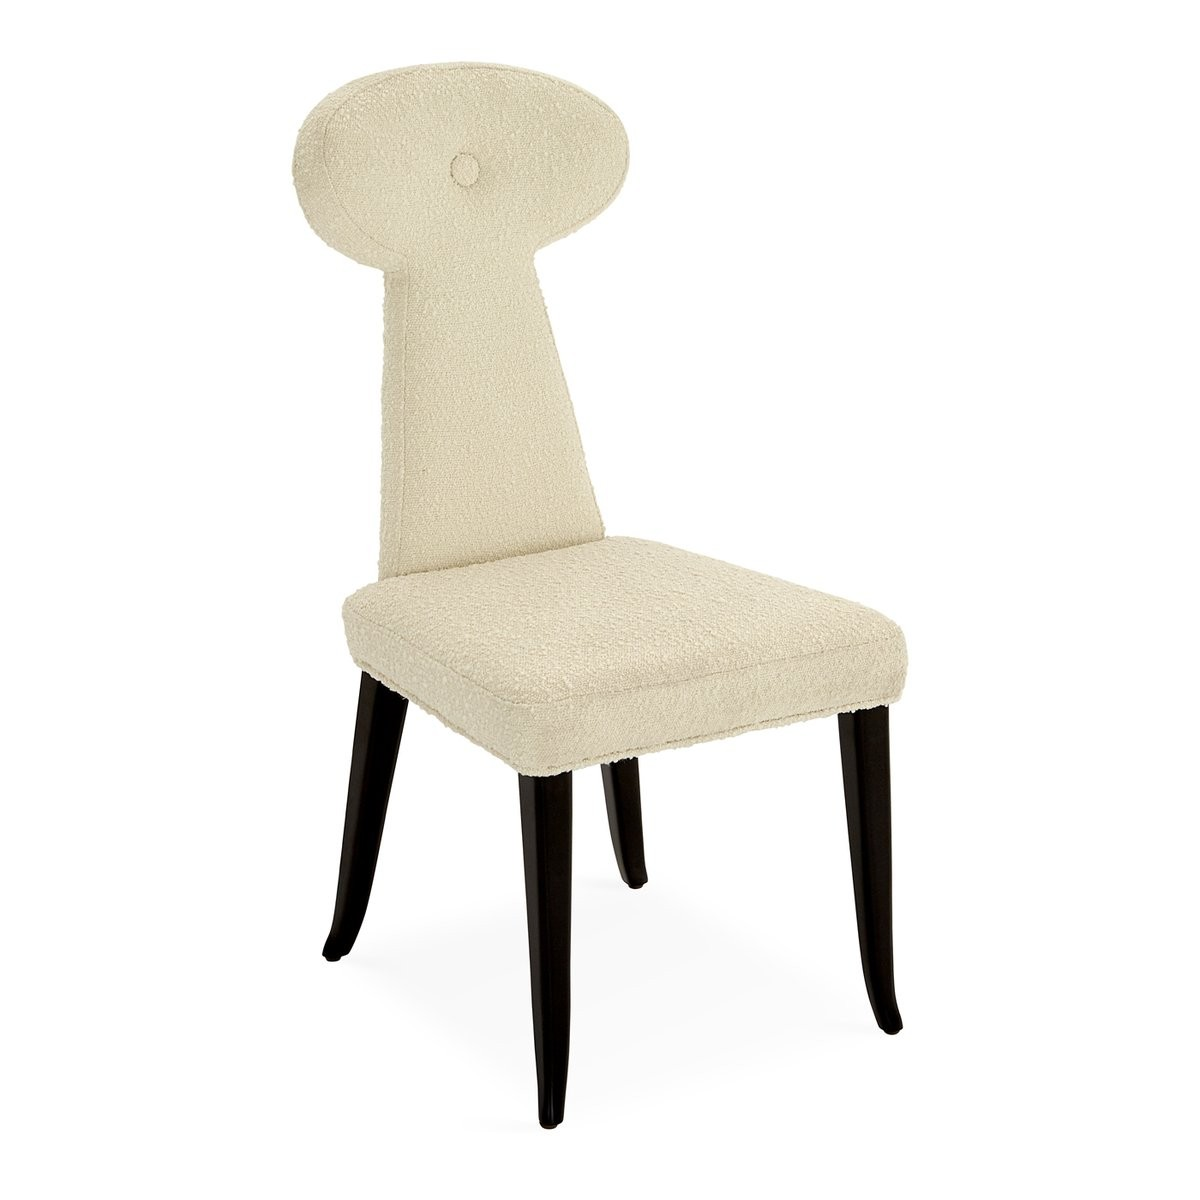 Jonathan Adler I Vera Dining Chair I Olympus Ivory